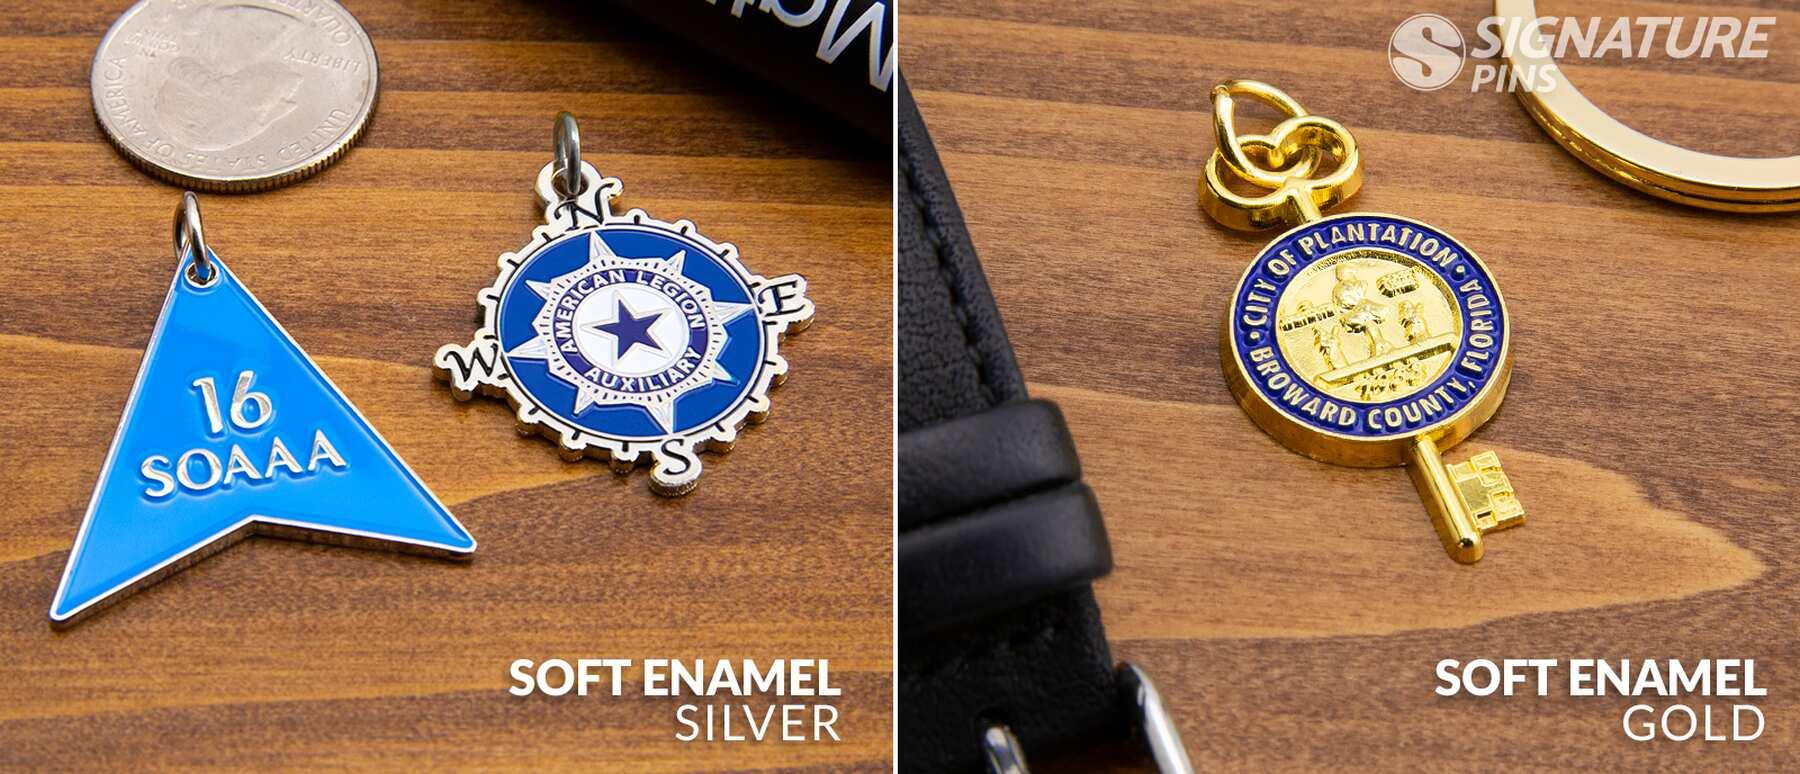 SignaturePins-Soft-Enamel-Charms